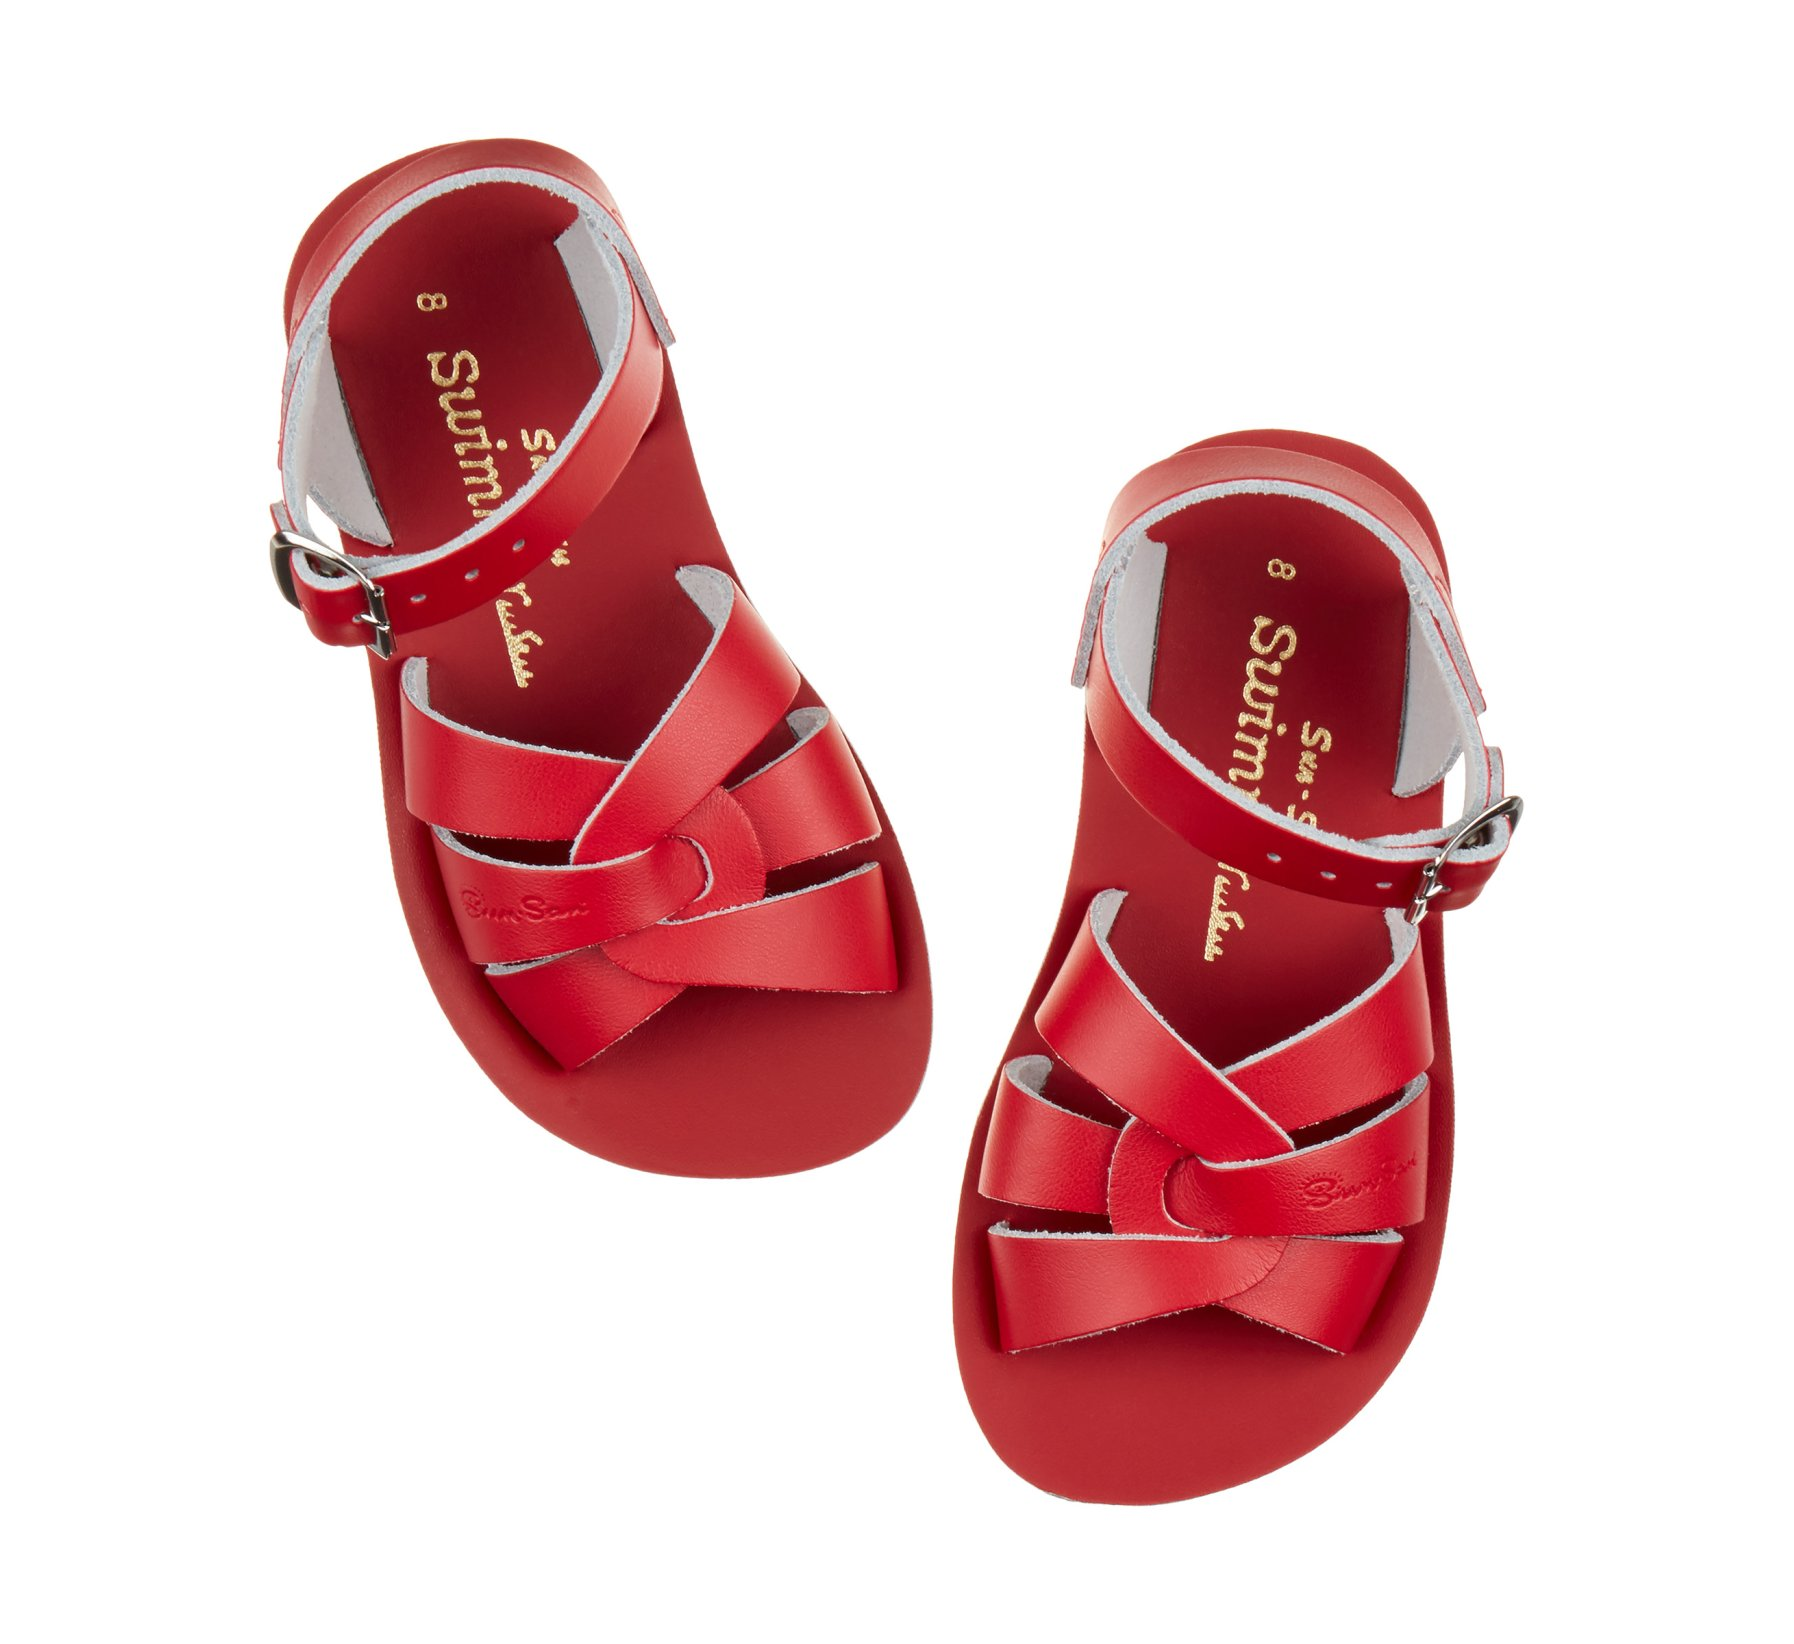 Swimmer in Rot - Salt Water Sandals